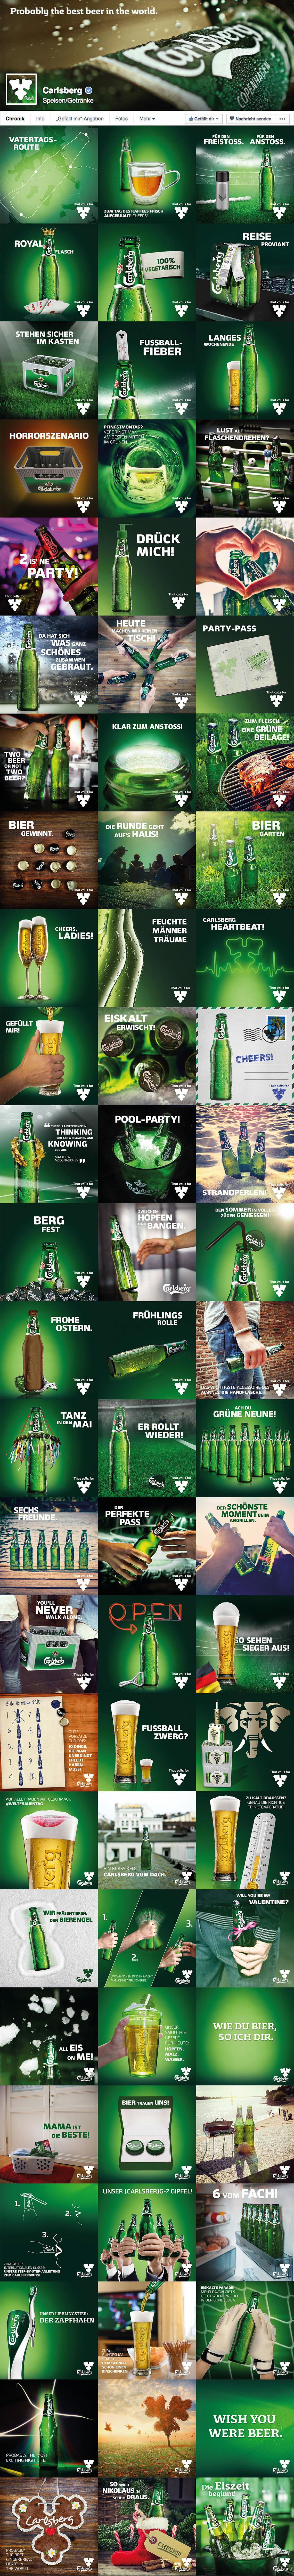 Carlsberg Social media facebook Postings